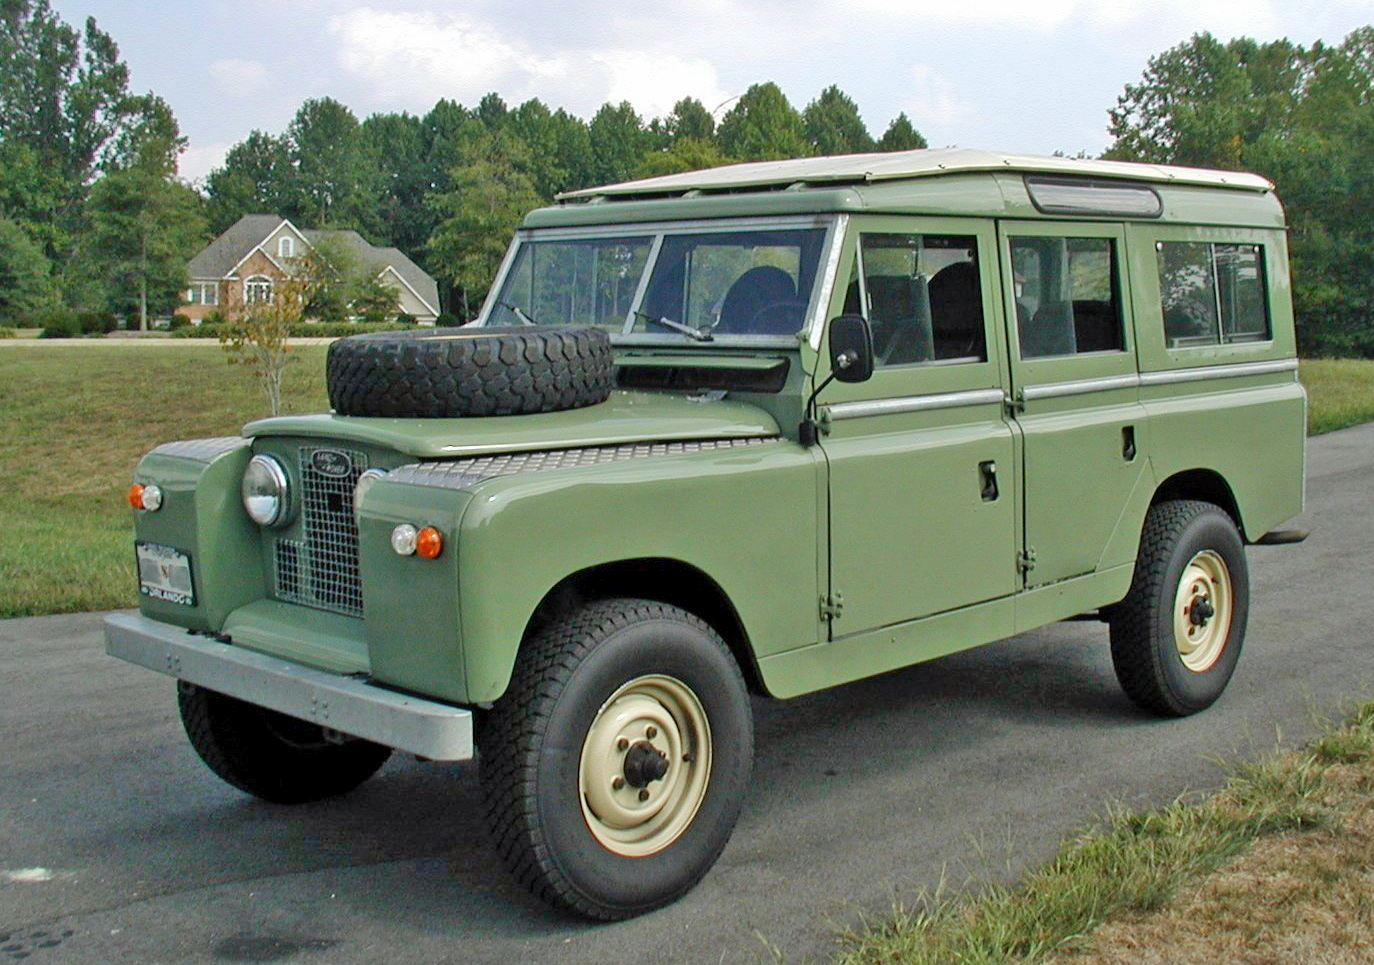 http://carsot.com/images/land-rover-series-iii-1971-1985-suv-5-door-exterior-1.jpg